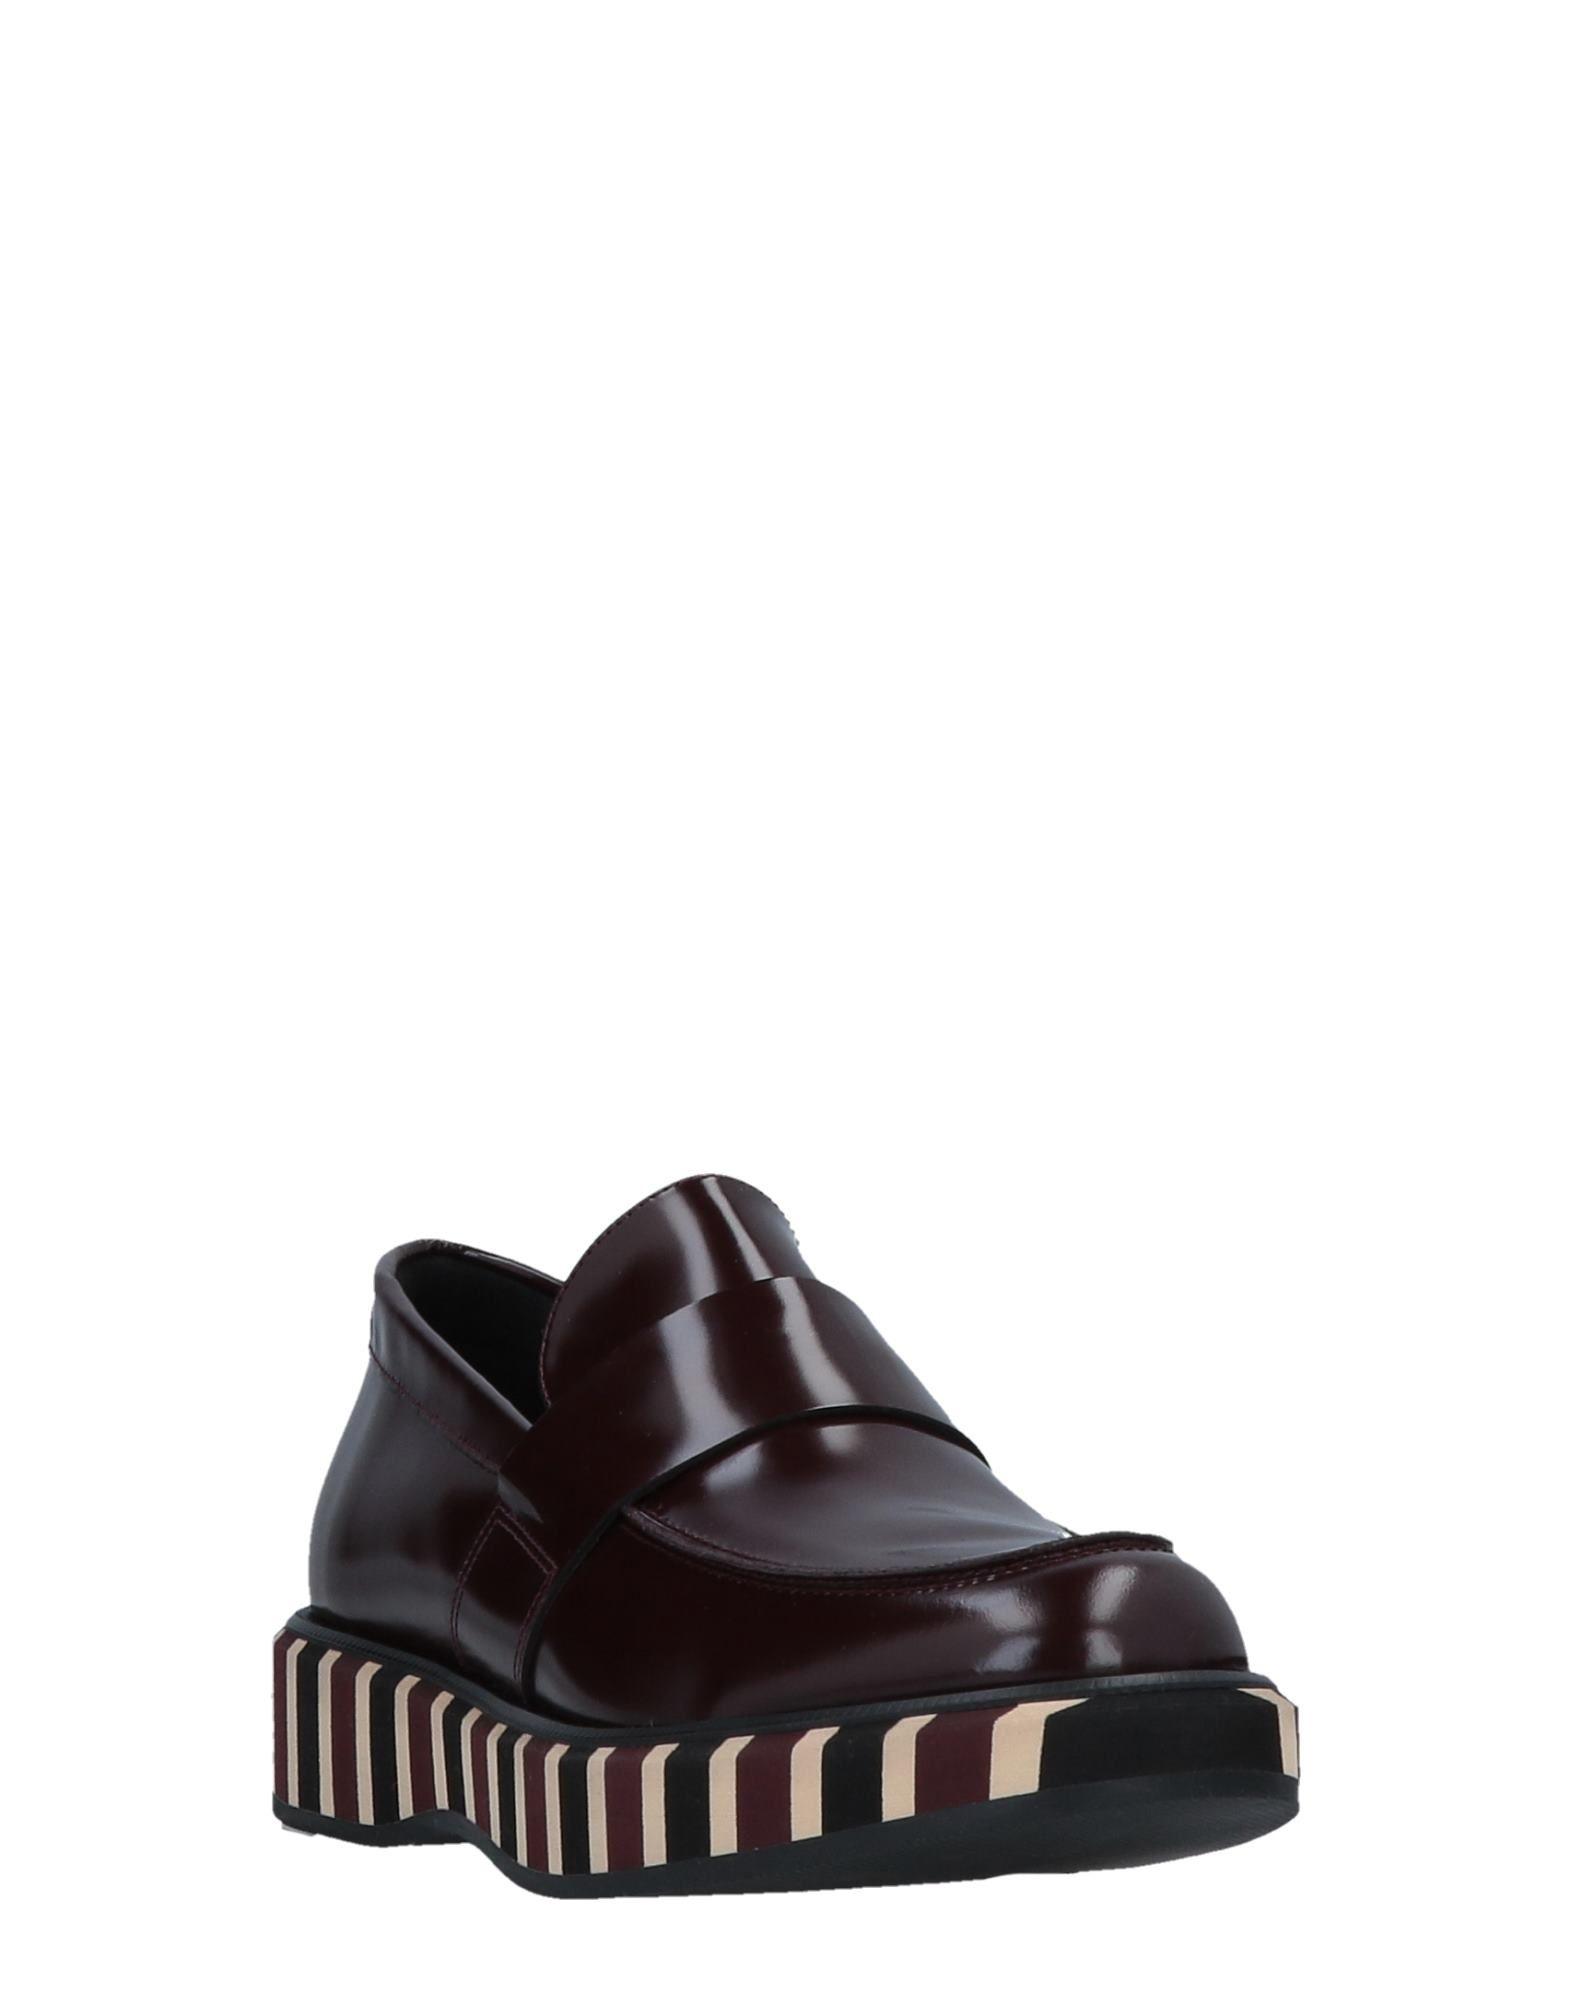 Paloma Barceló Gute Mokassins Damen  11512992WQ Gute Barceló Qualität beliebte Schuhe 5fa352